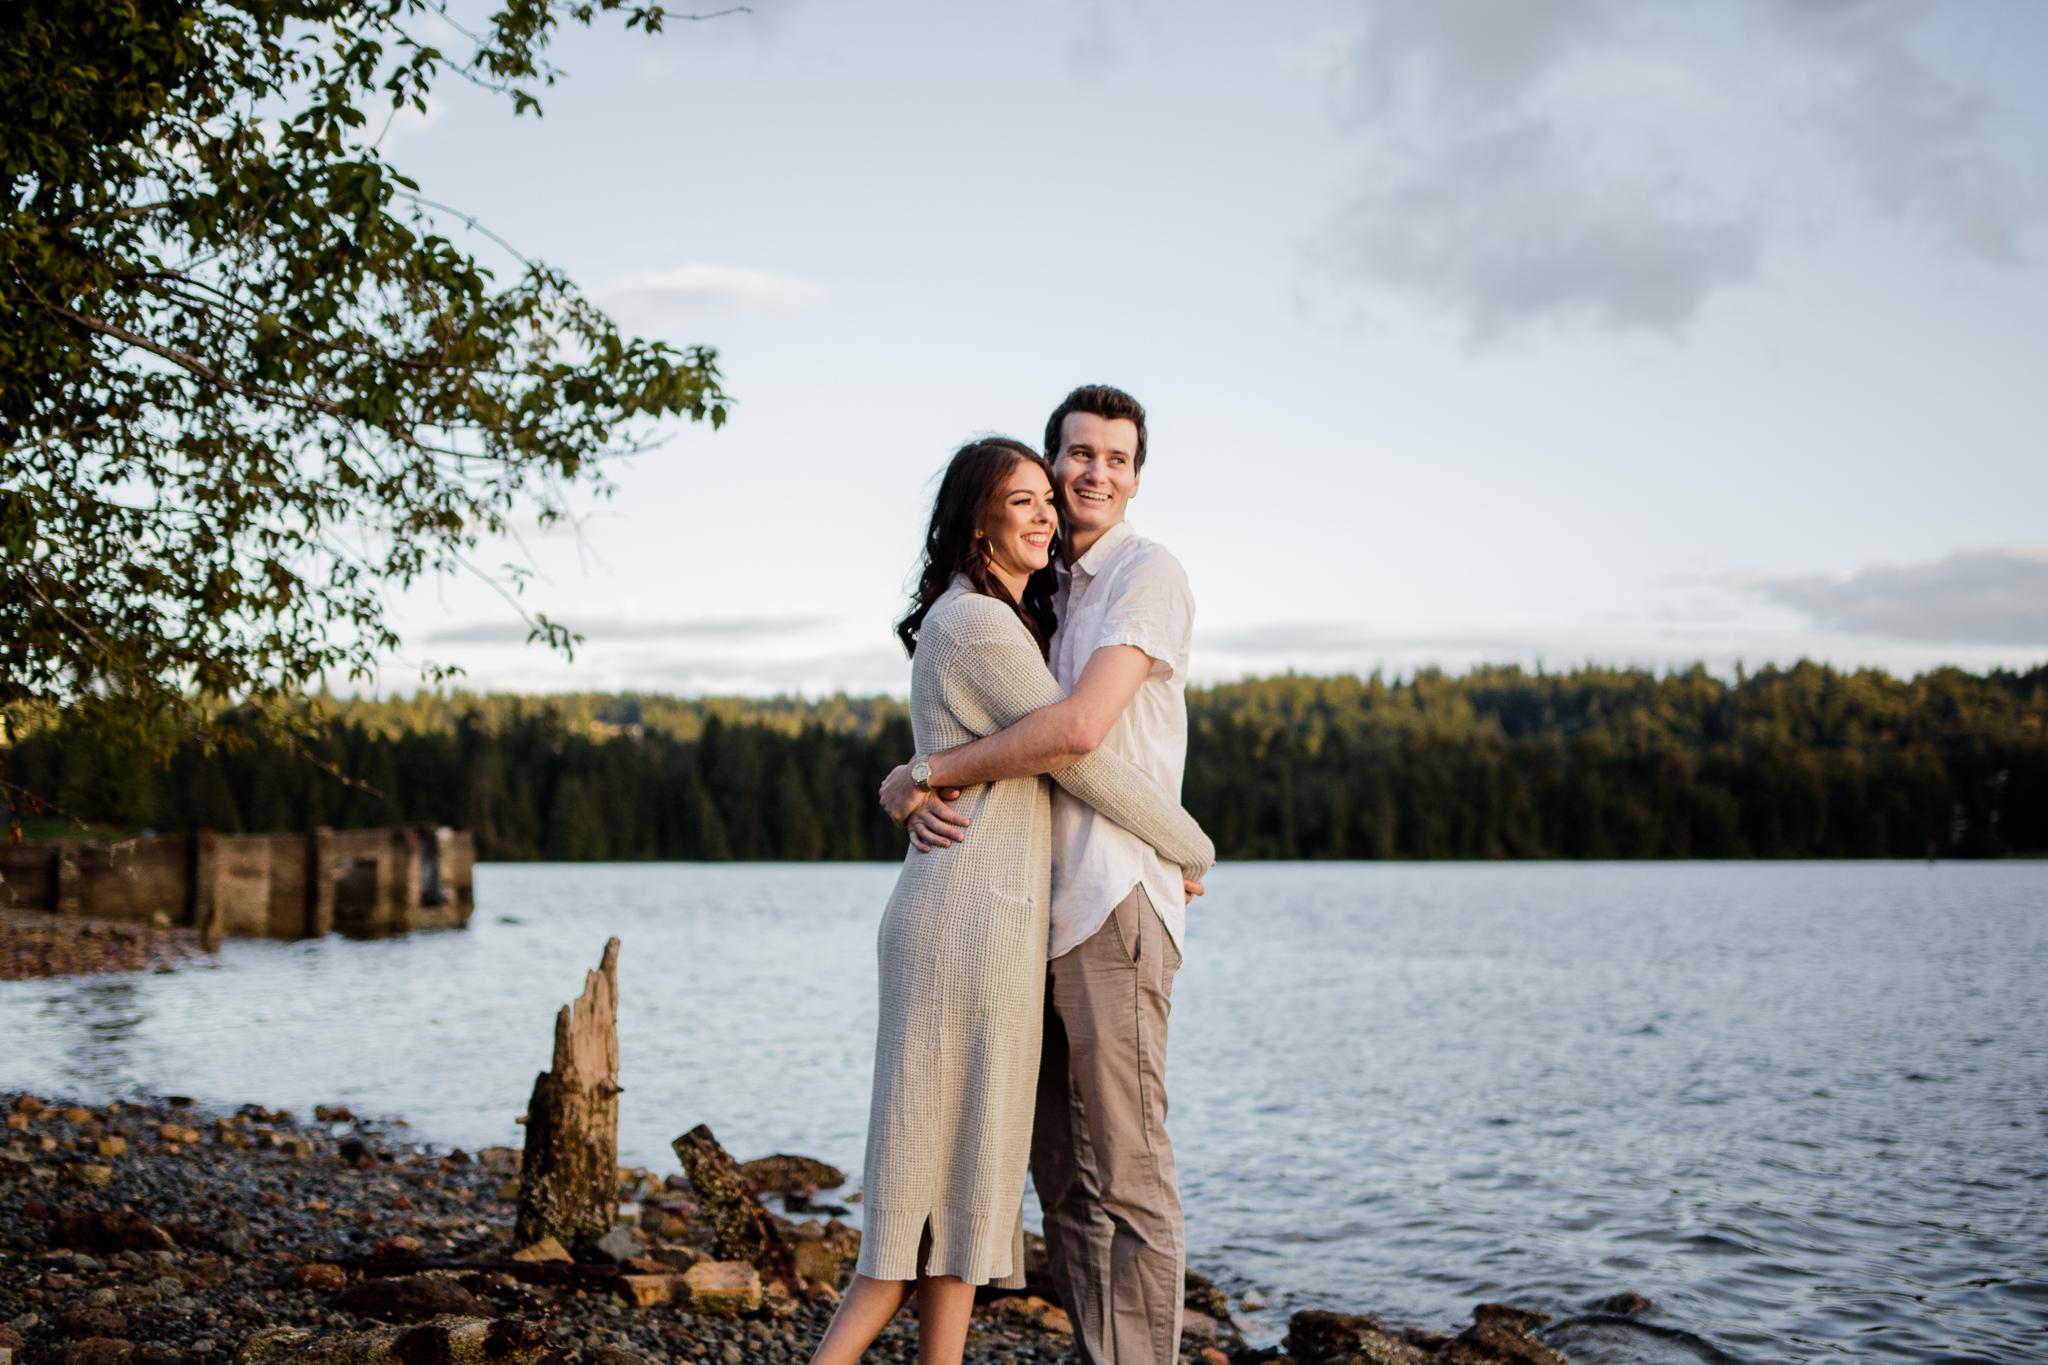 Photo of Buntzen Lake Anmore British Columbia Landscape Best Fun Engagement Photographer Port Moody Wedding Sunset Romantic Couple Photos 177.jpg